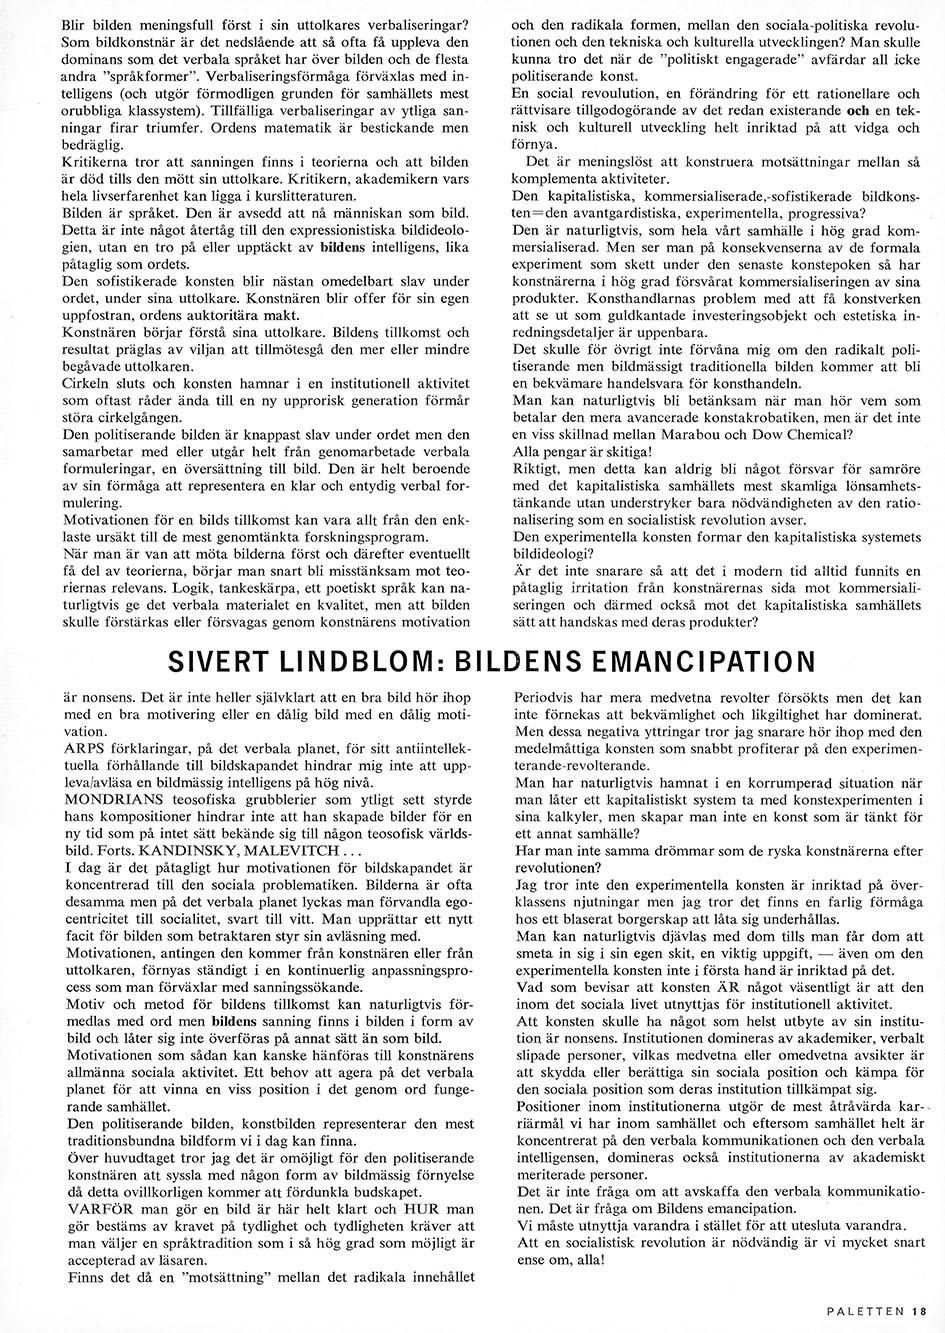 Sivert Lindblom Paletten Nr 2 1968 3-